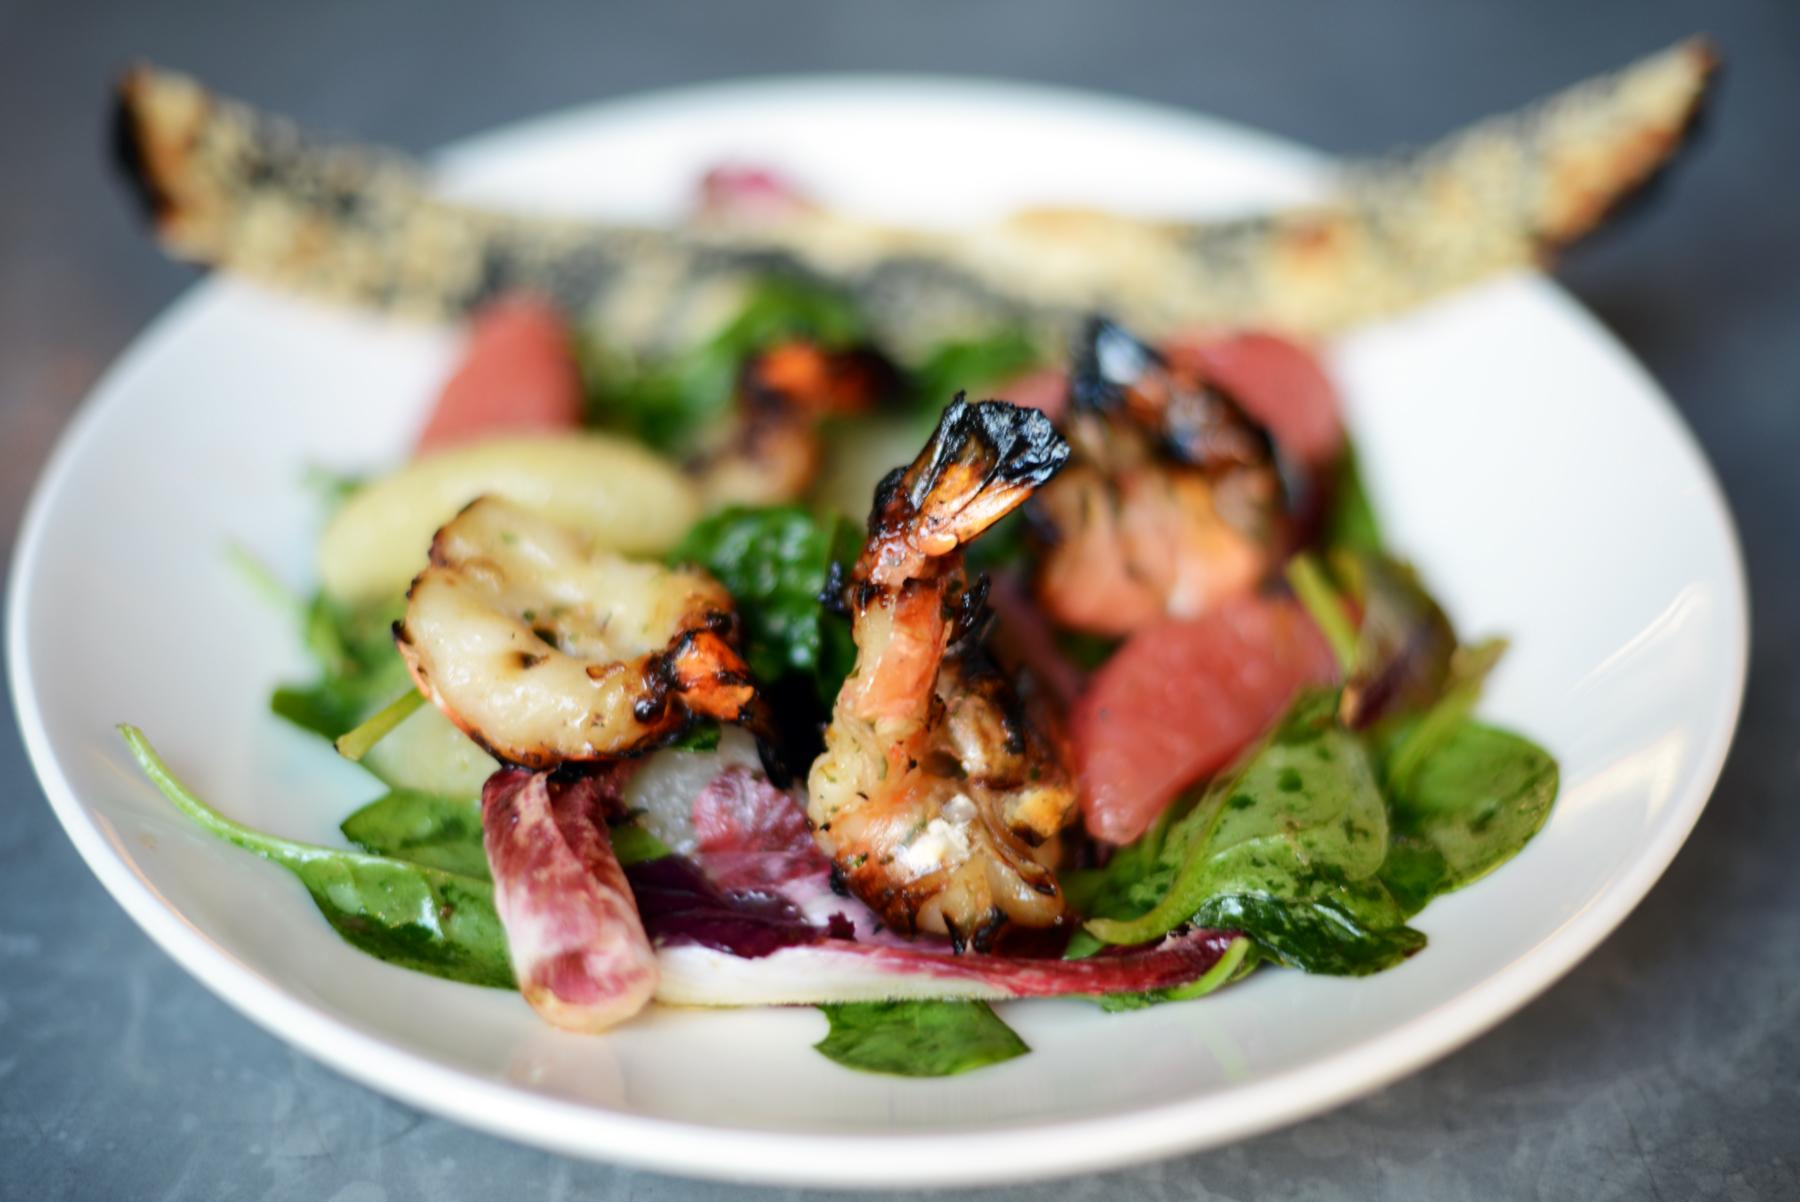 Prawn and pomelo salad